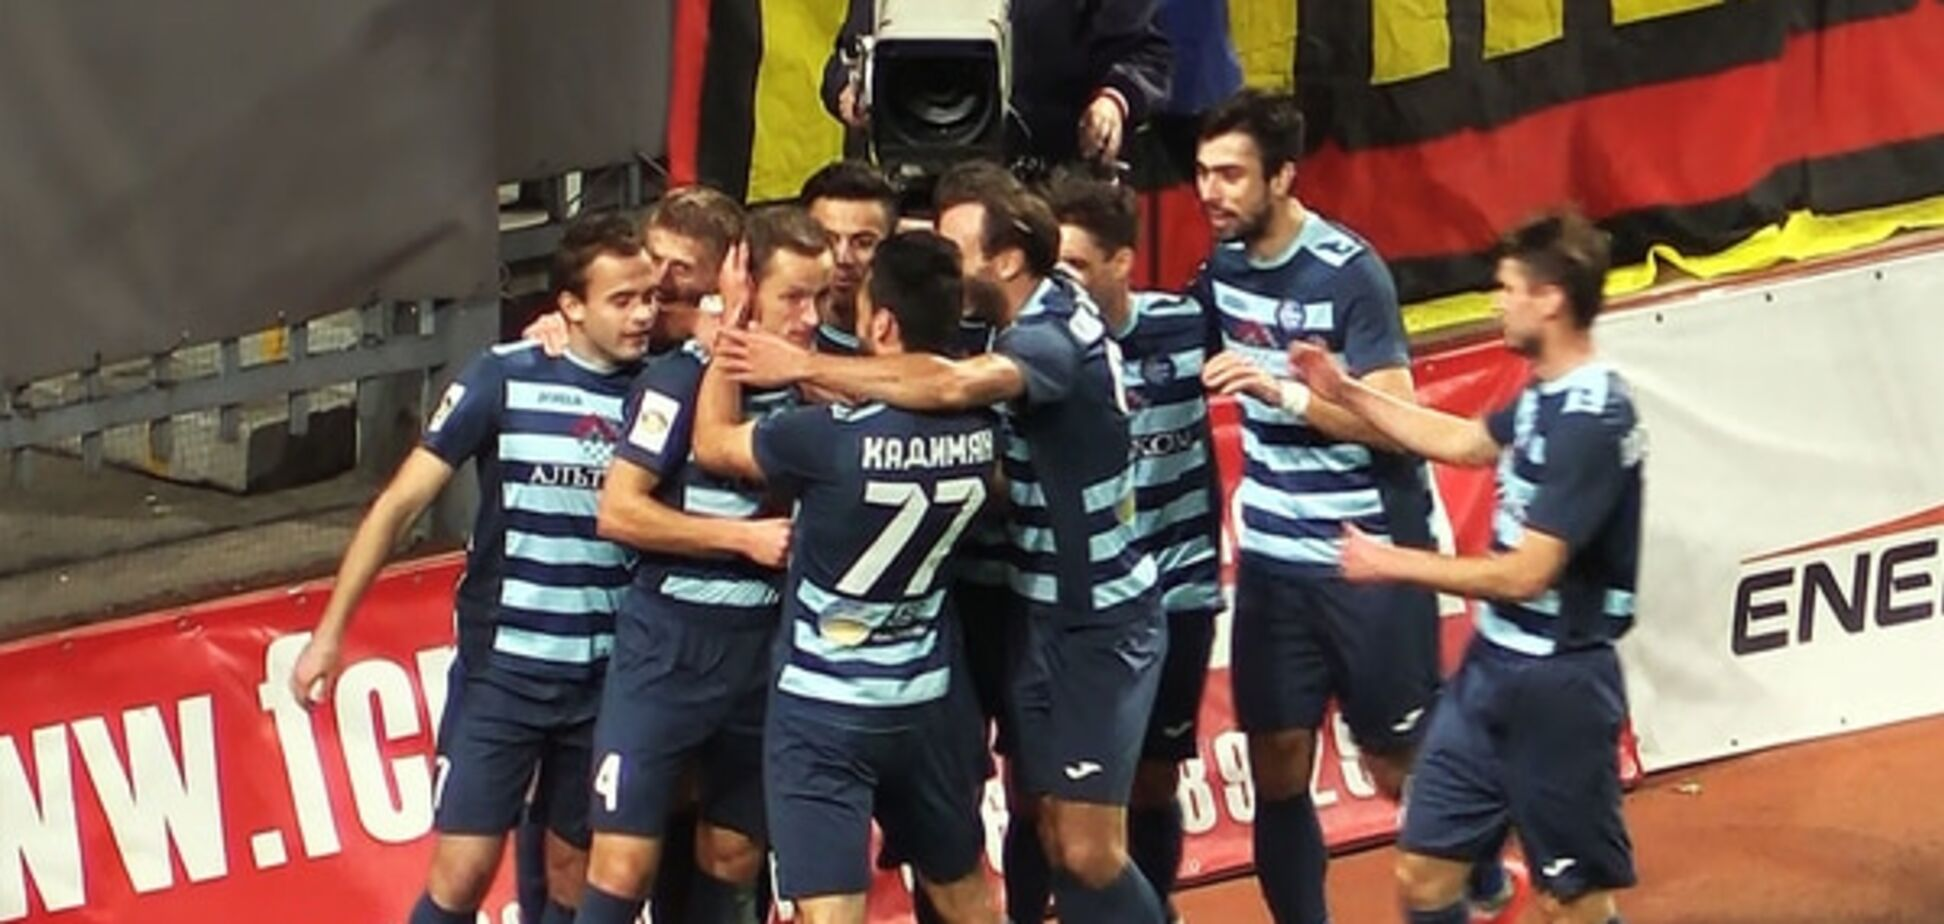 Металлург - Олимпик - 0-3: видео-обзор матча